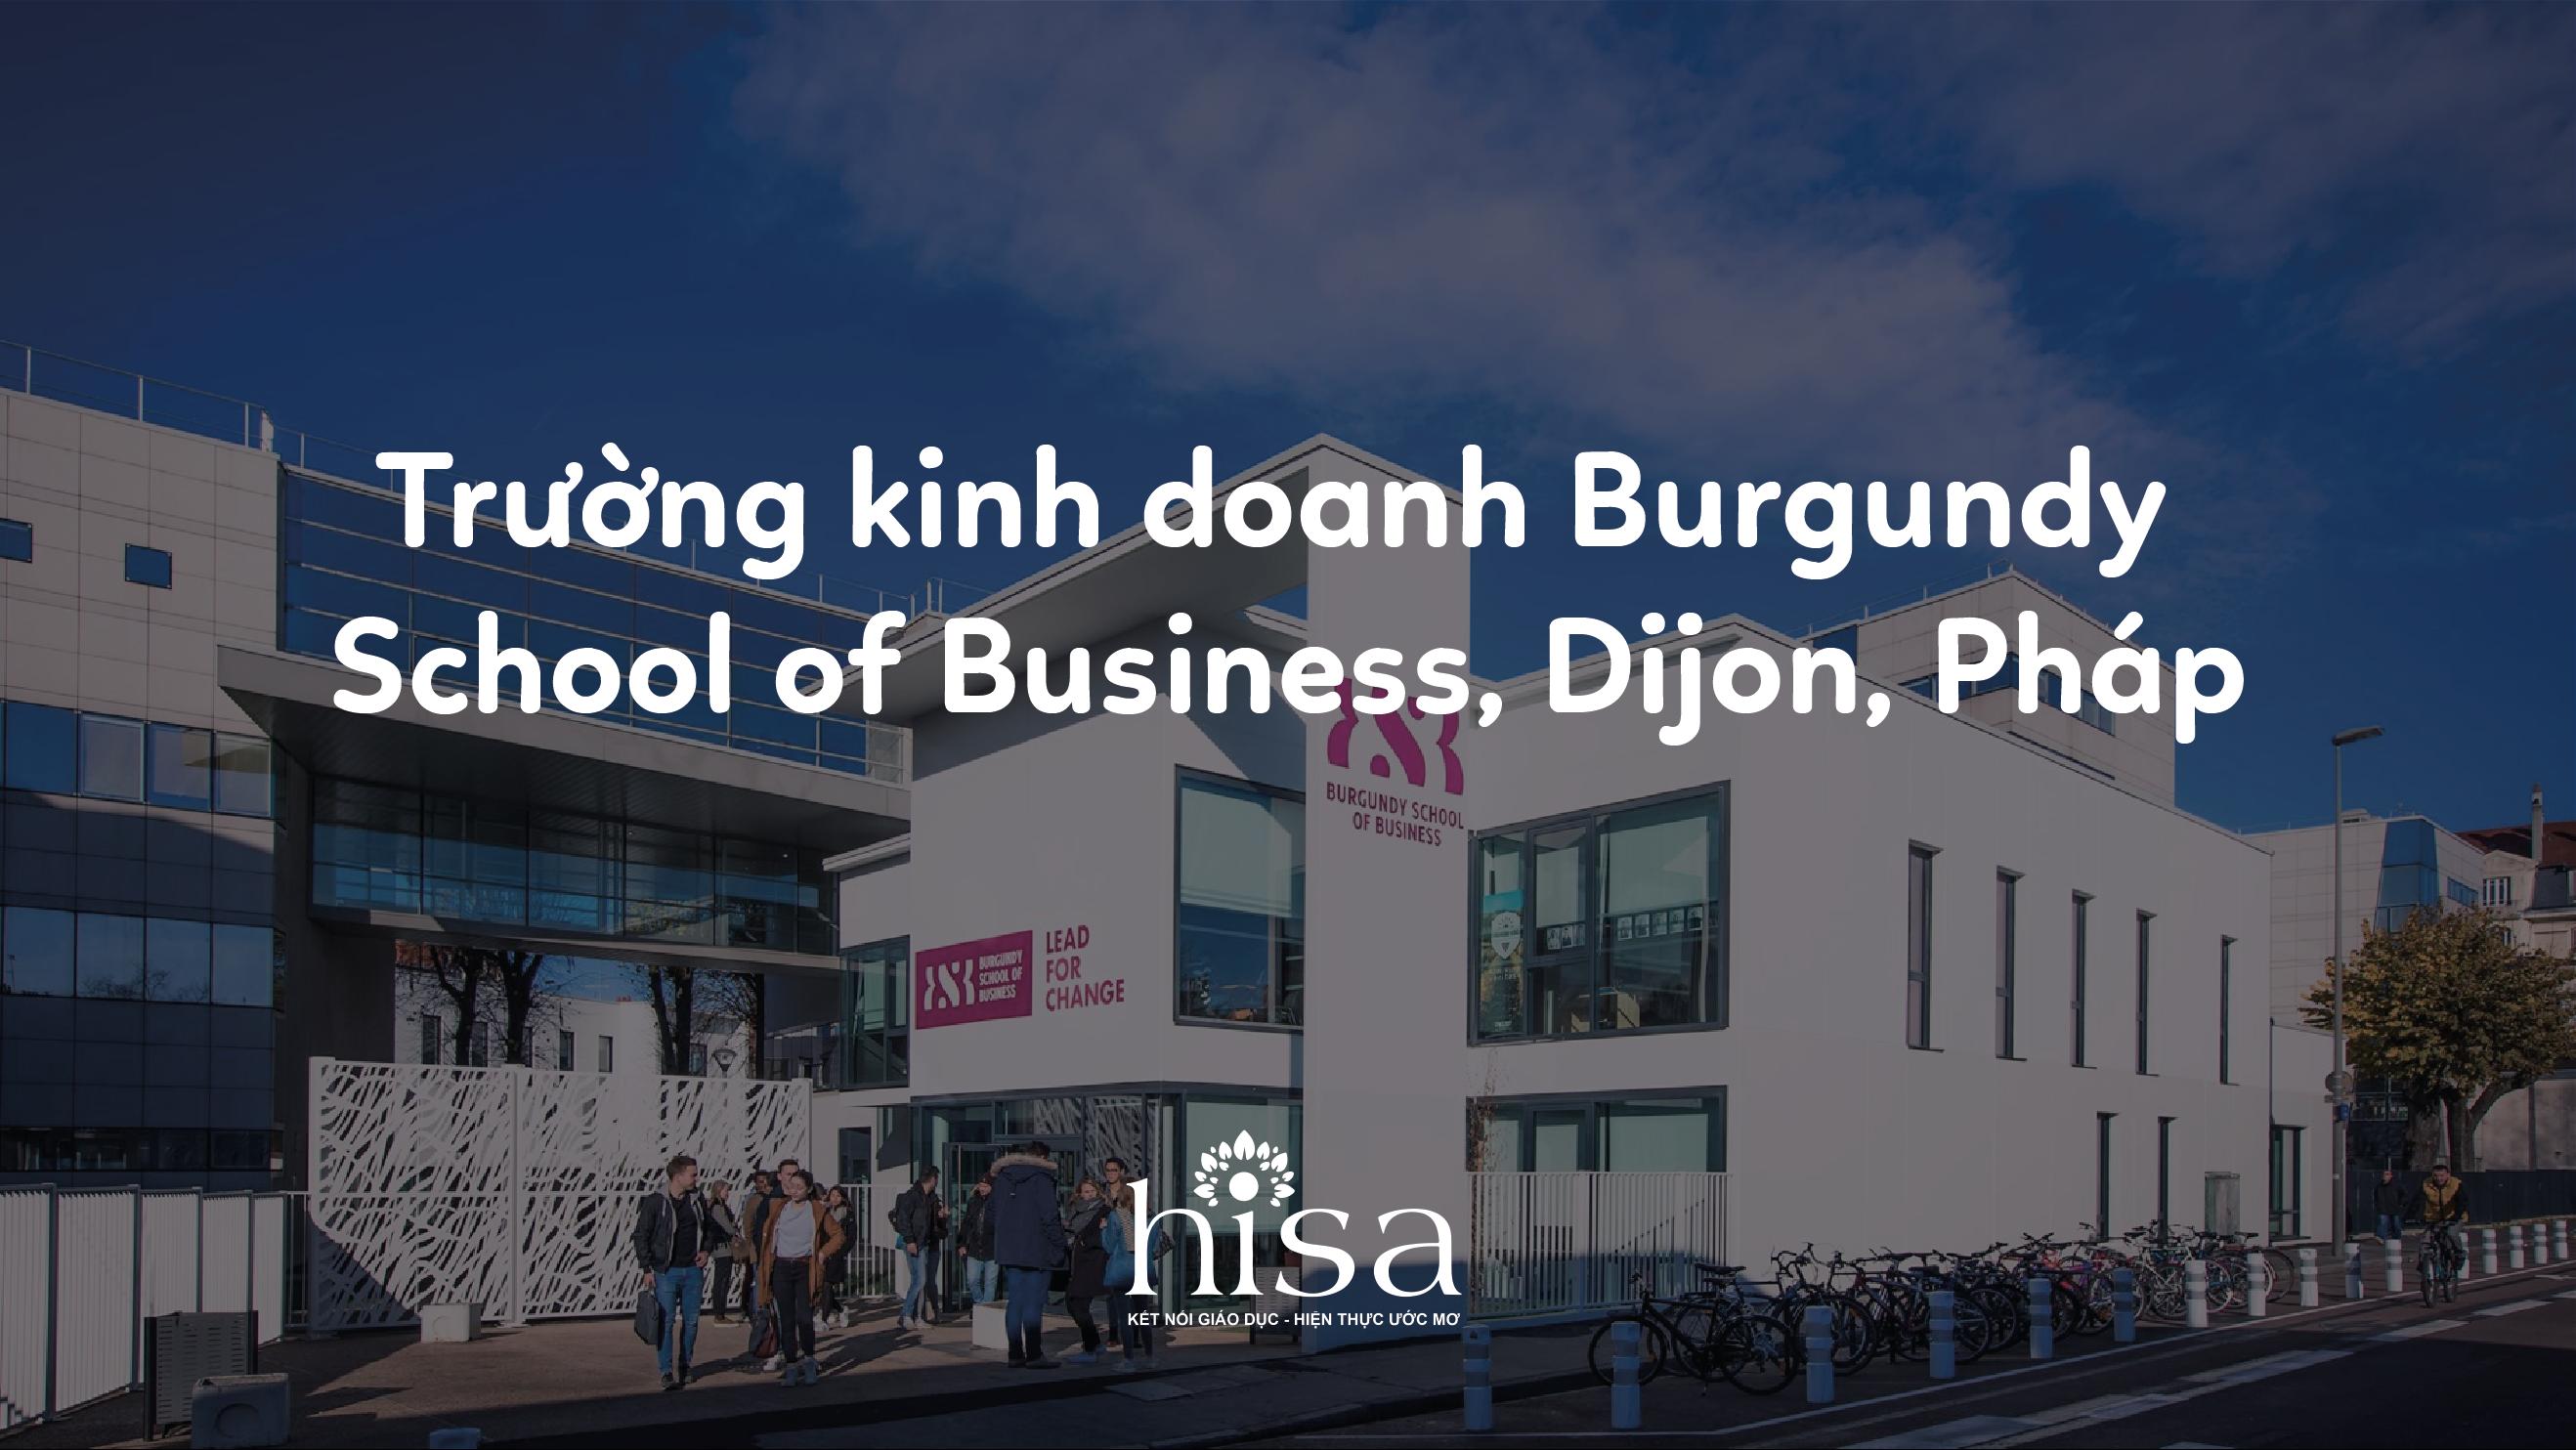 Burgundy School of Business, Dijon, Pháp